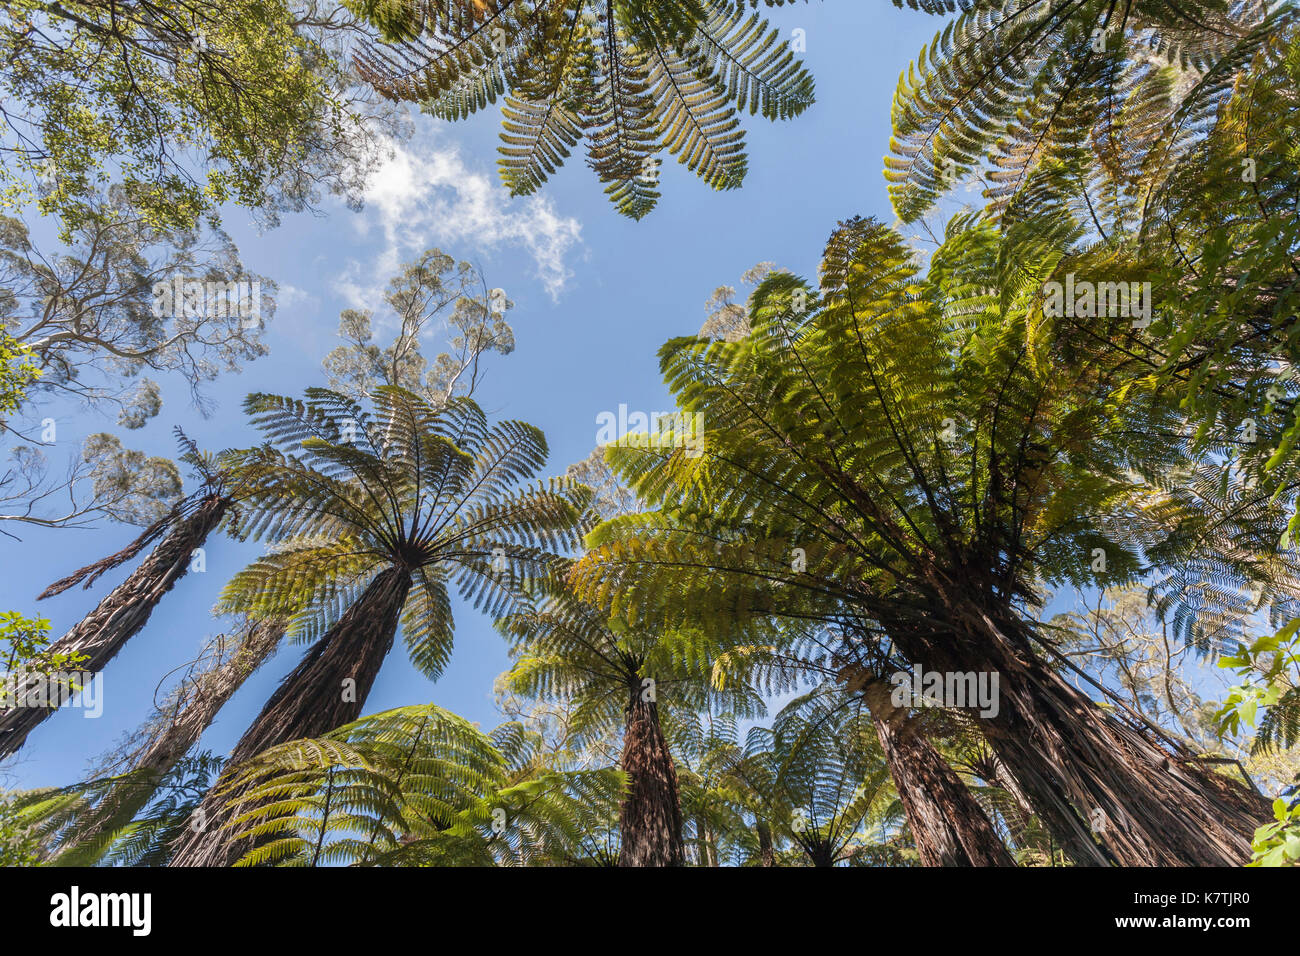 New Zealand native Baumfarne (Dicksonia squarrosa) in der Nähe von Rotorua, Neuseeland Stockbild